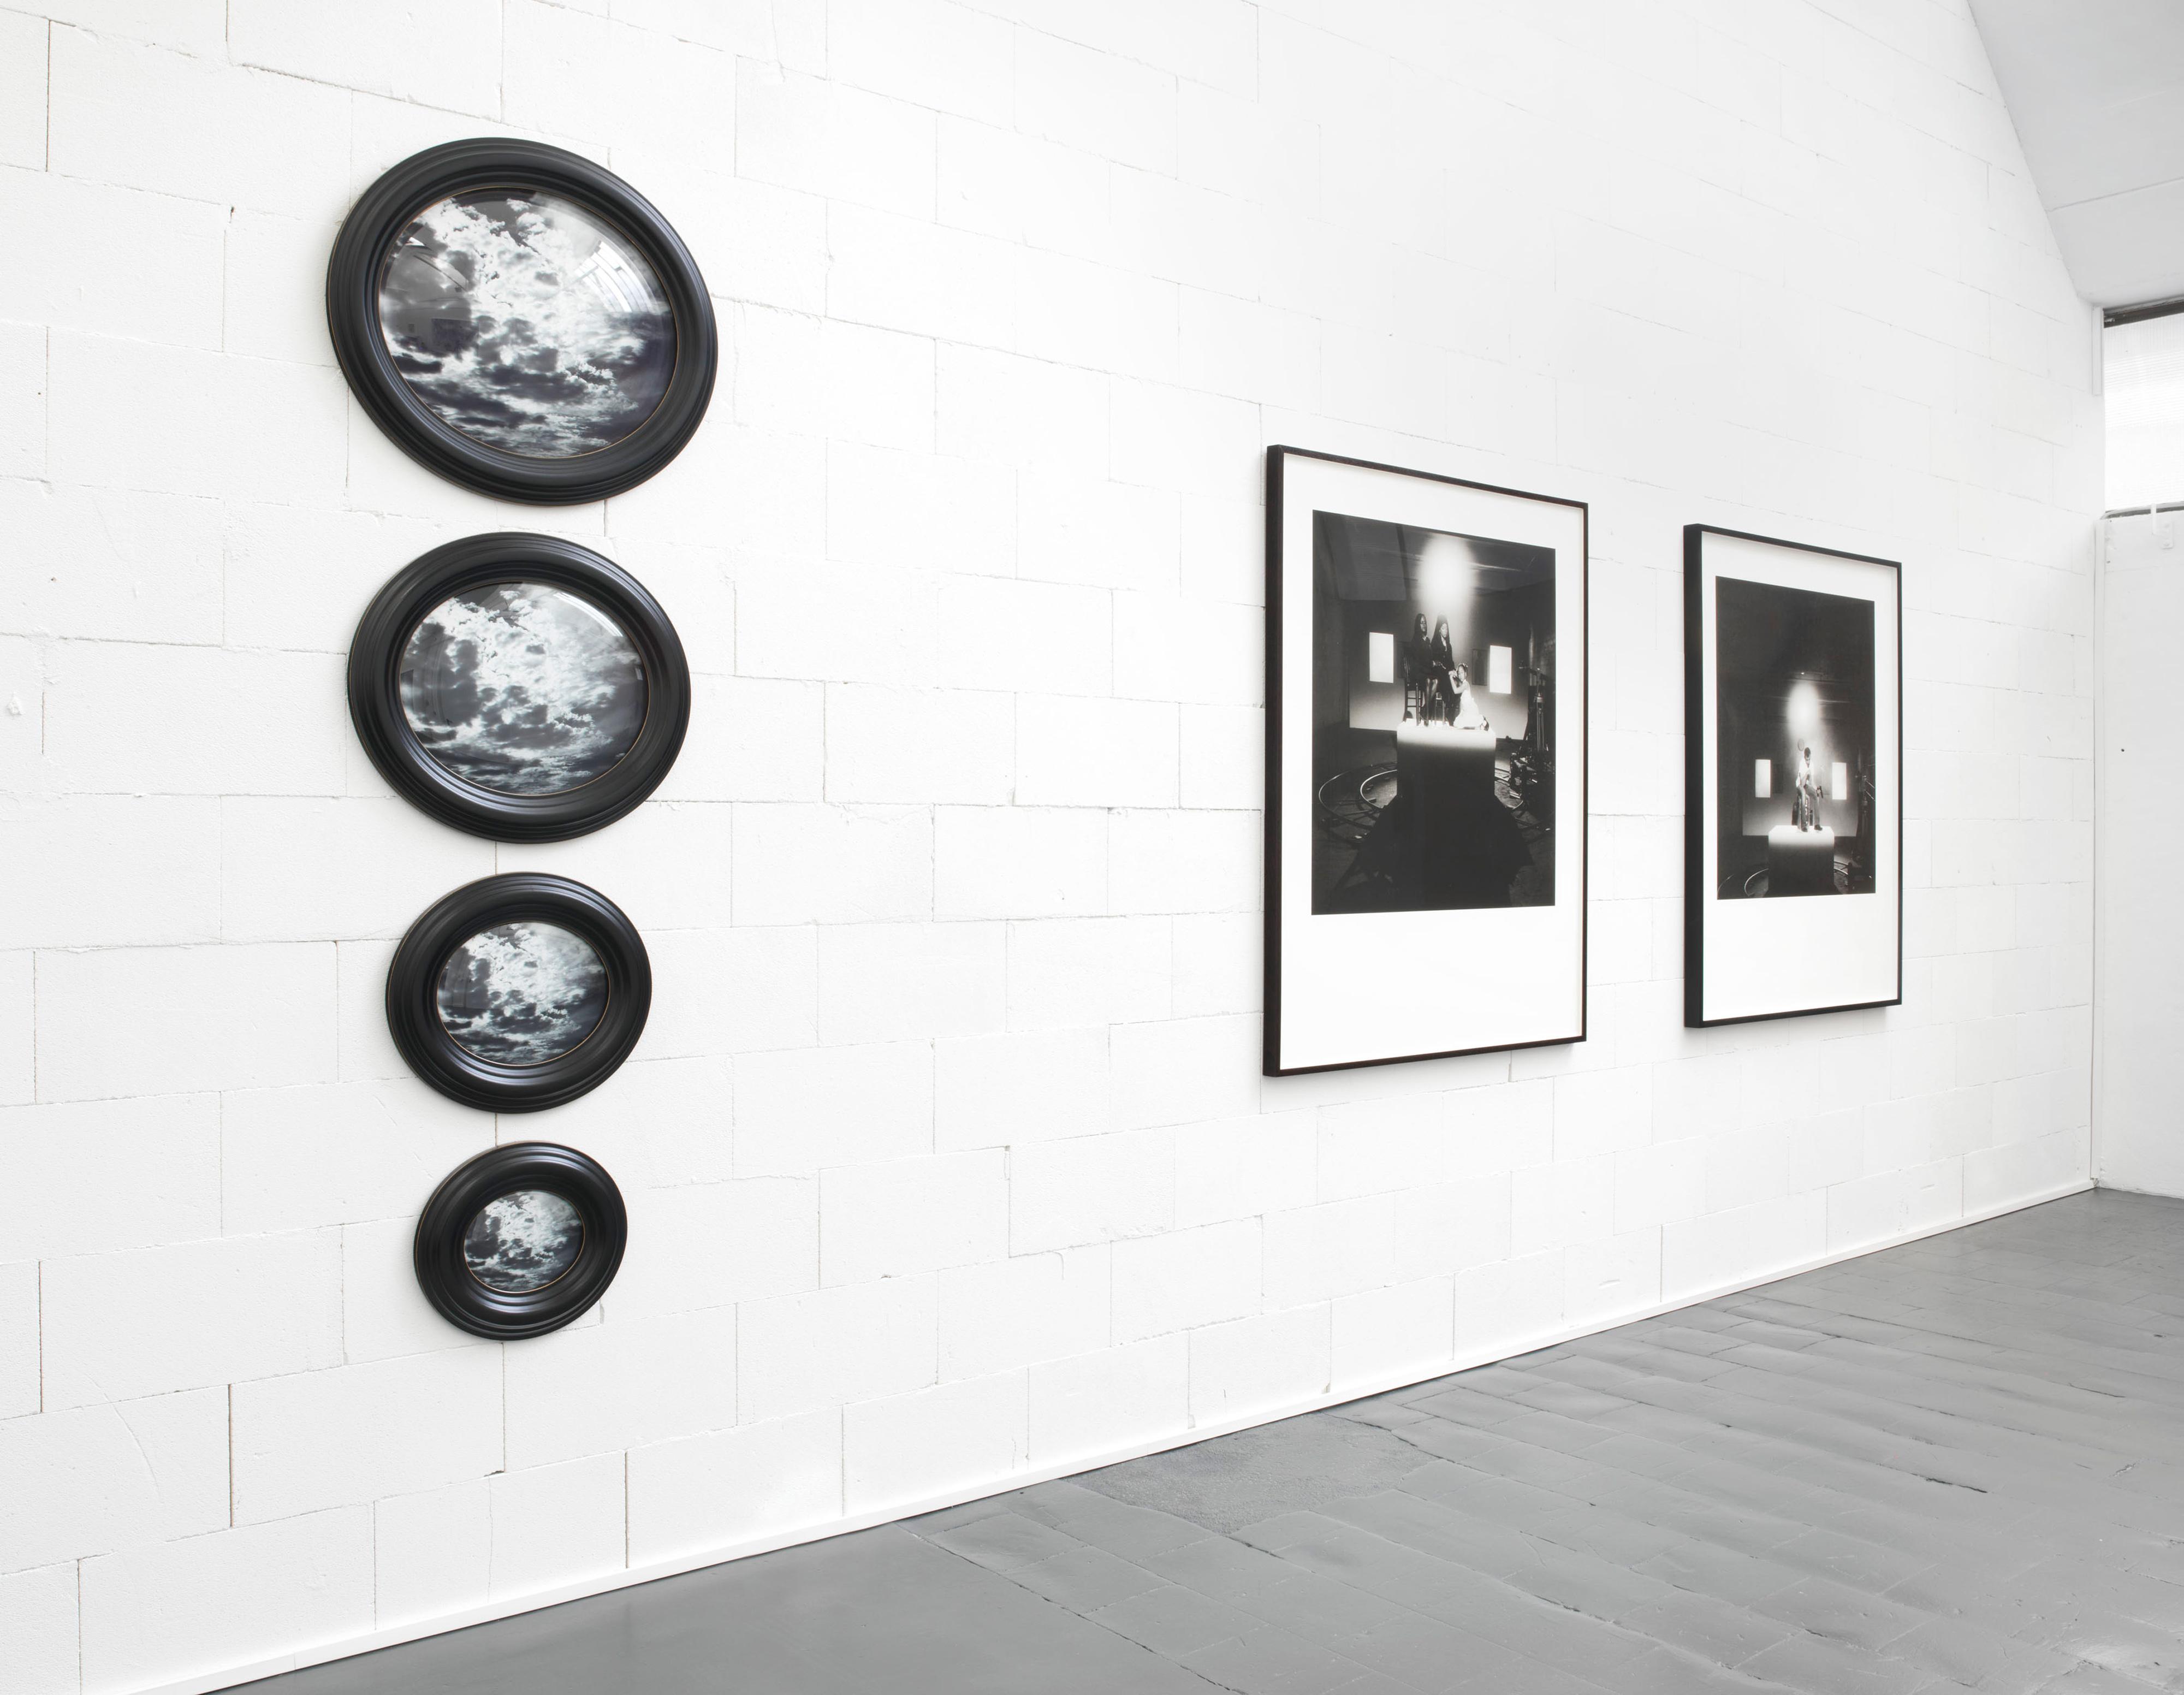 Galerie Barbara Thumm \ Carrie Mae Weems – Push